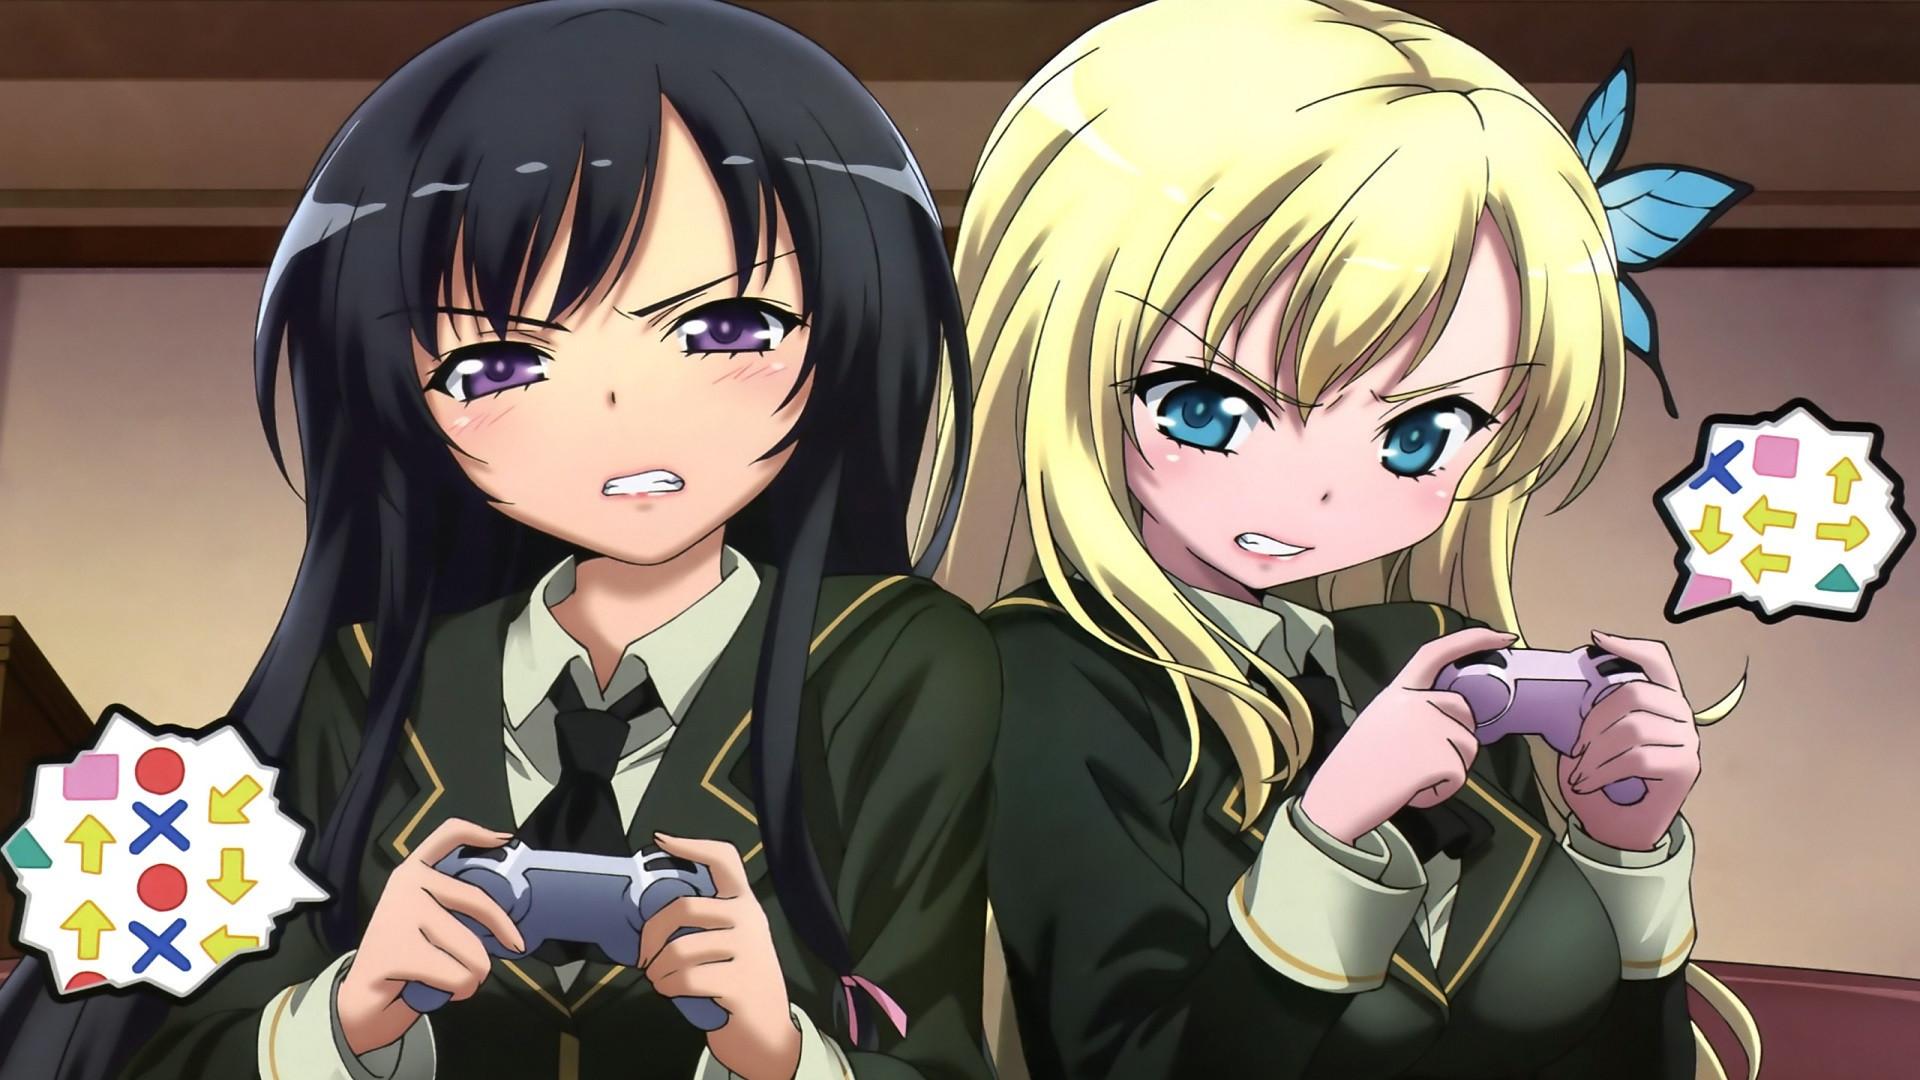 Supreme Girl Iphone Wallpaper Anime Gamer Wallpaper 71 Images